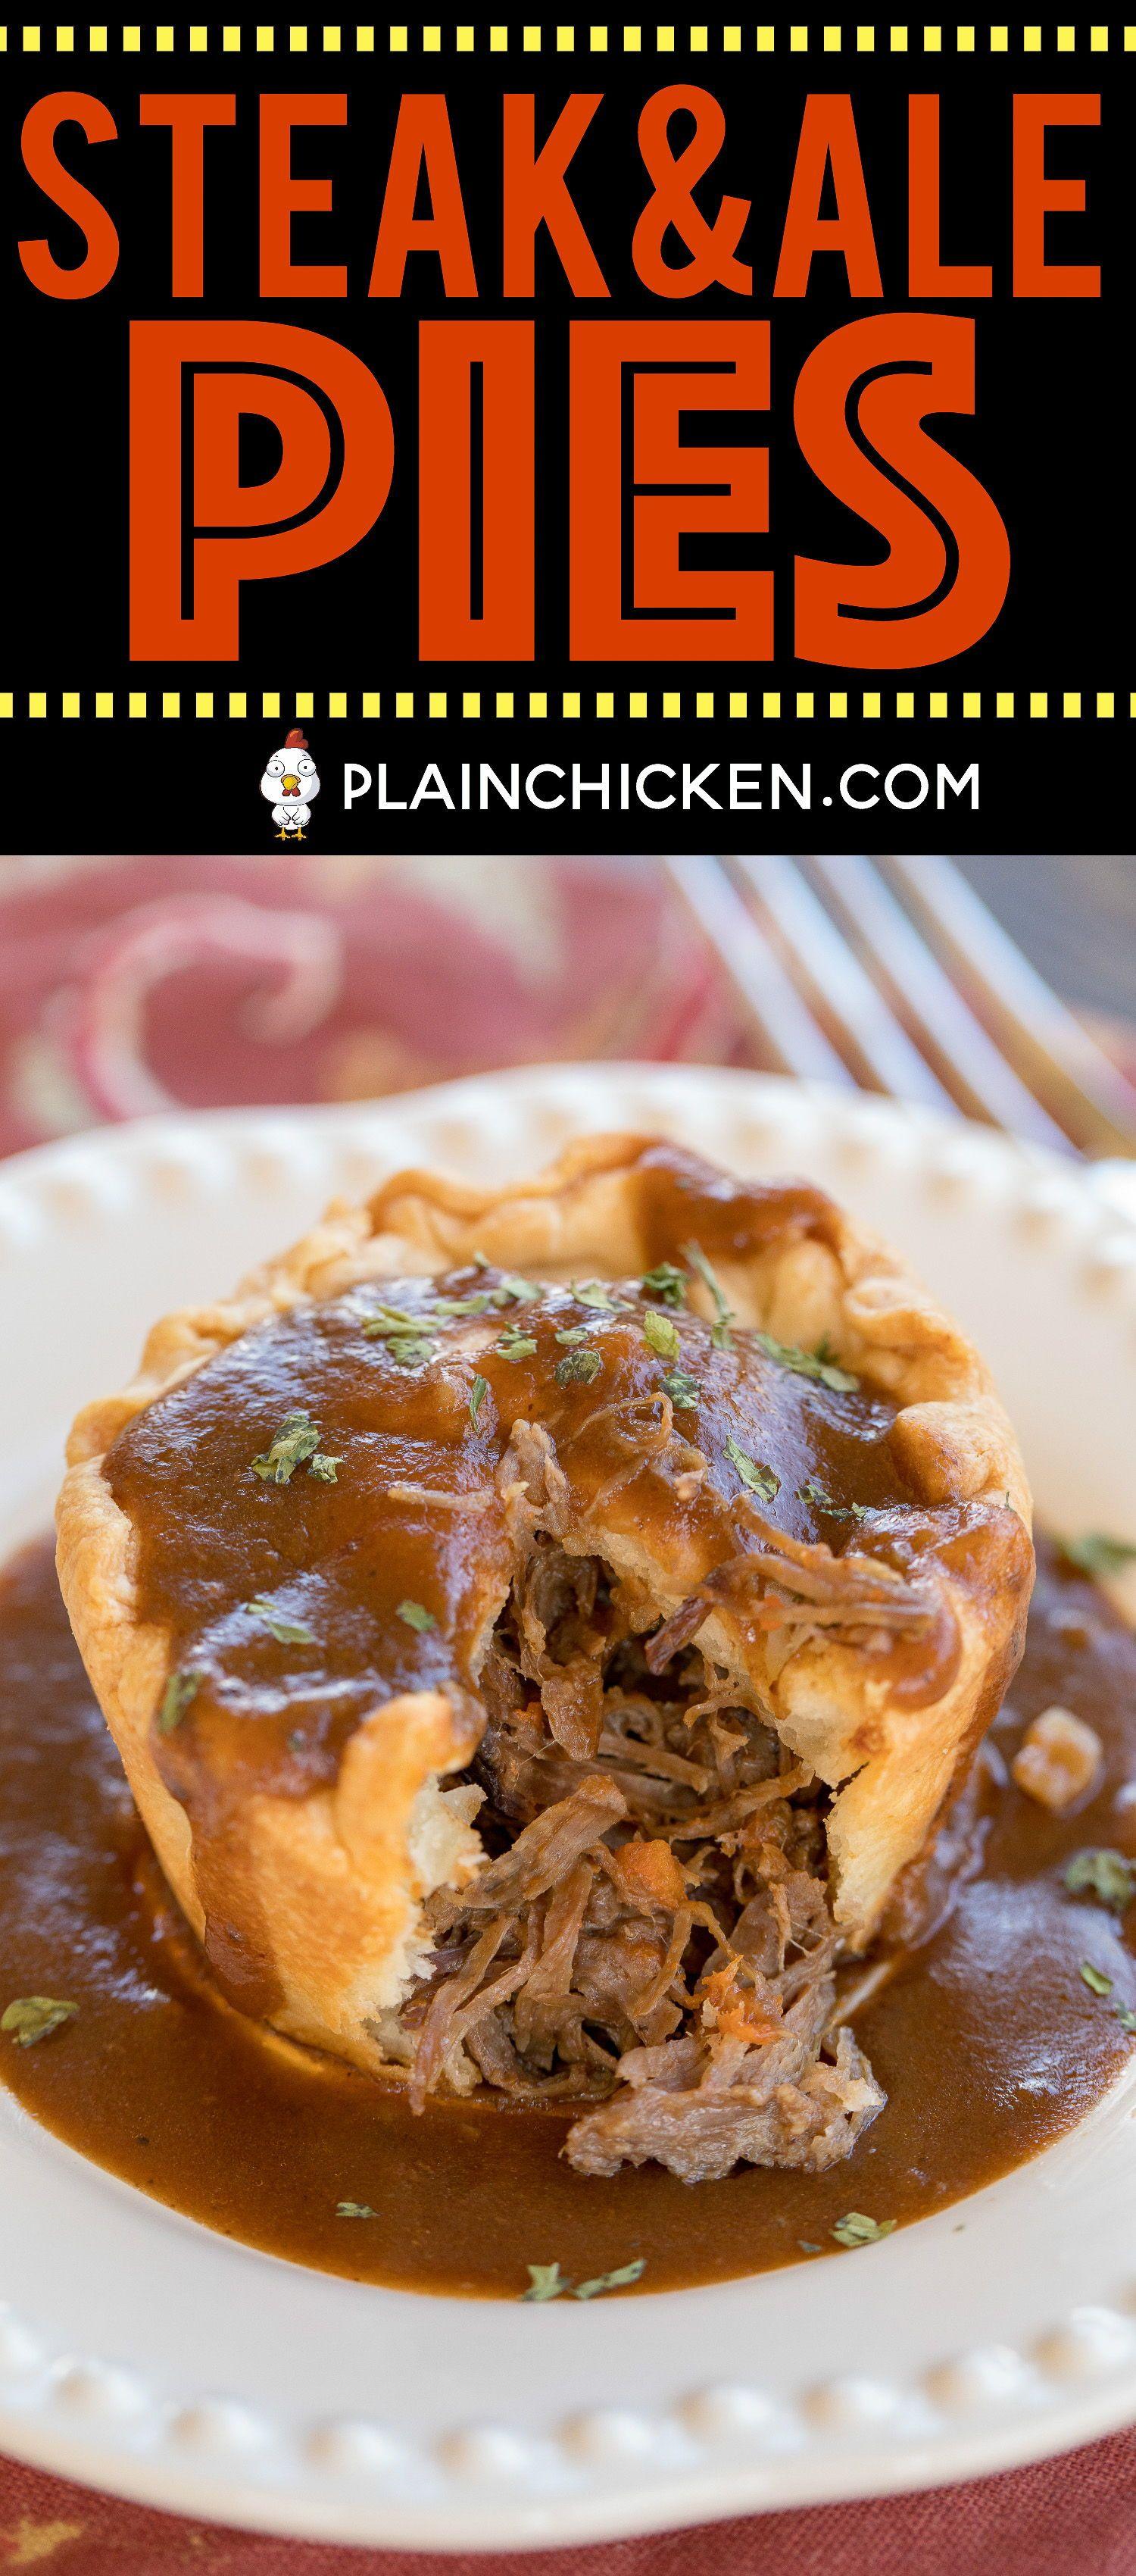 Mini Steak & Ale Pies - Guinness pot roast in pie crust ...